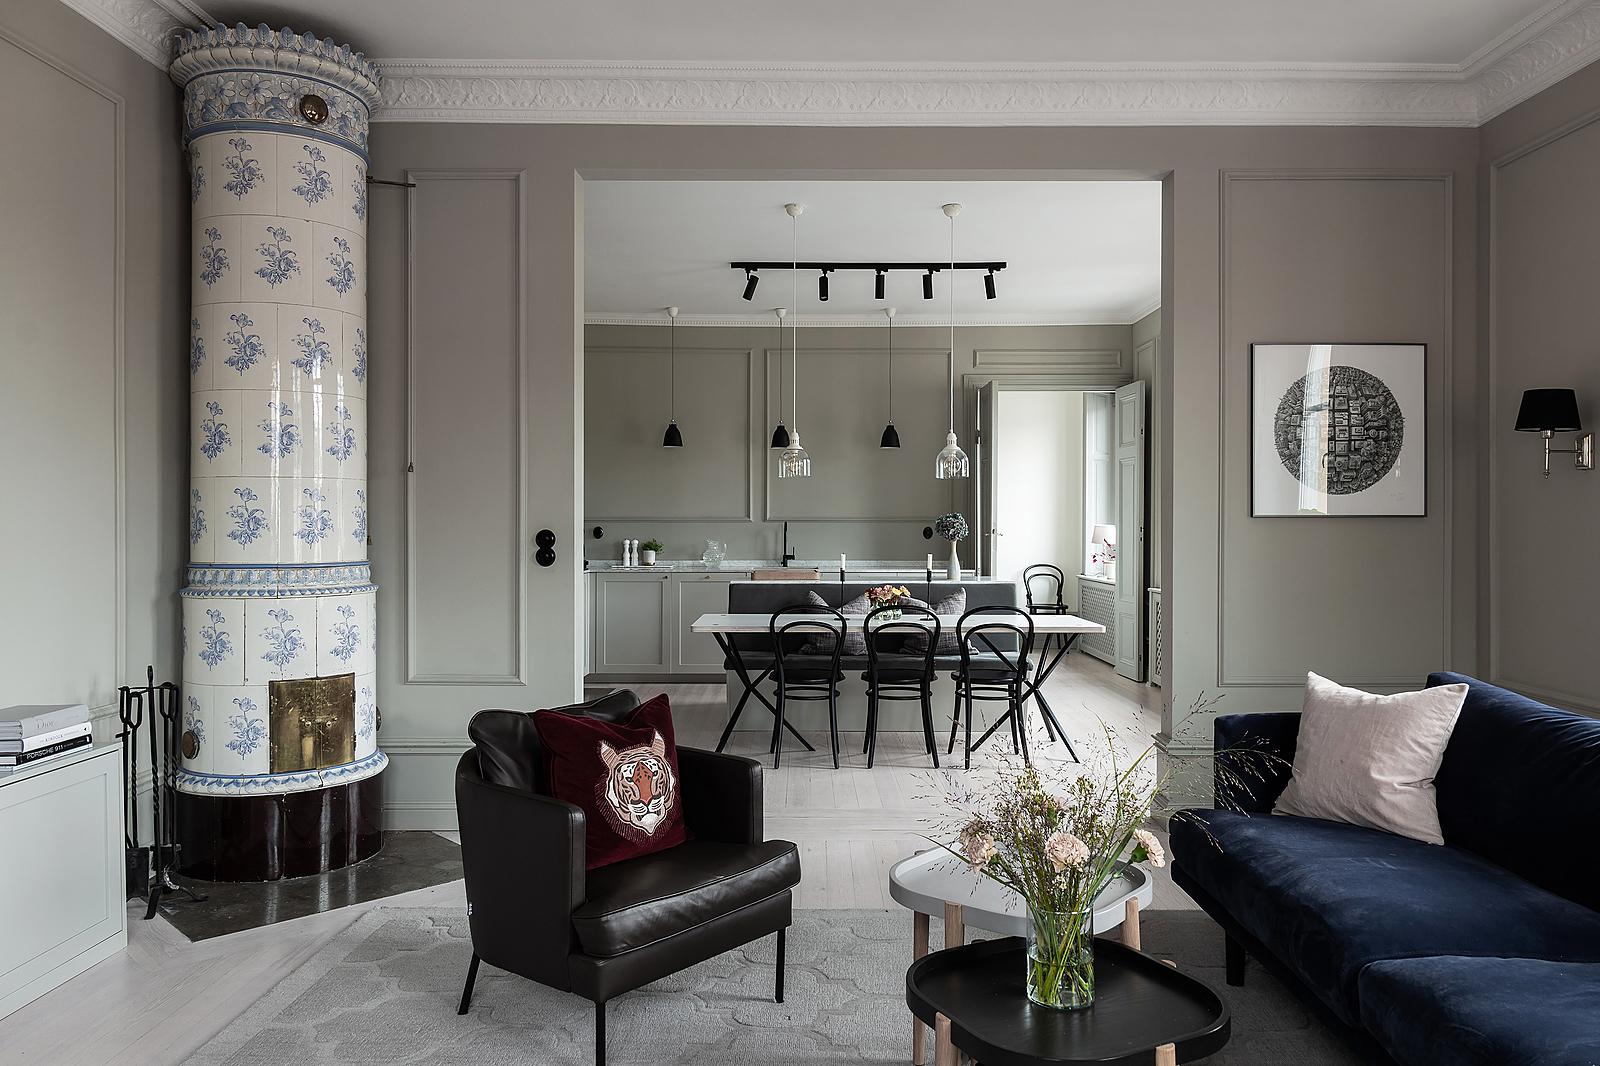 New York interiördesign vardagsrumsexempel med elegant, modernt utseende